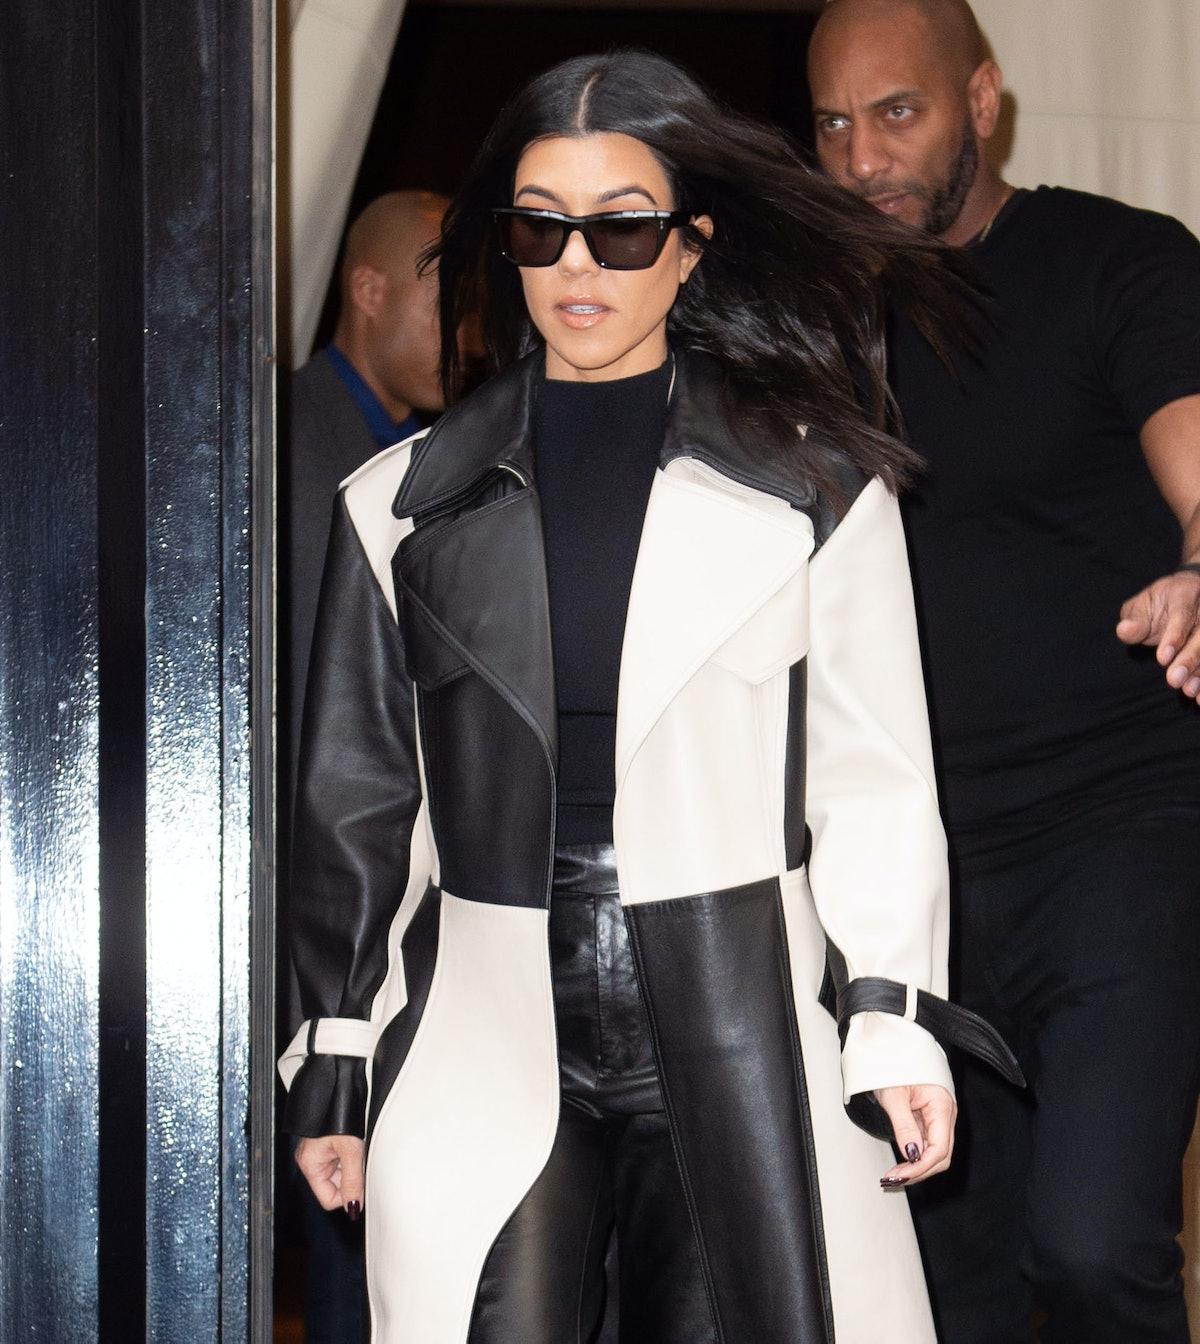 Kourtney Kardashian steps out in a black and white jacket.